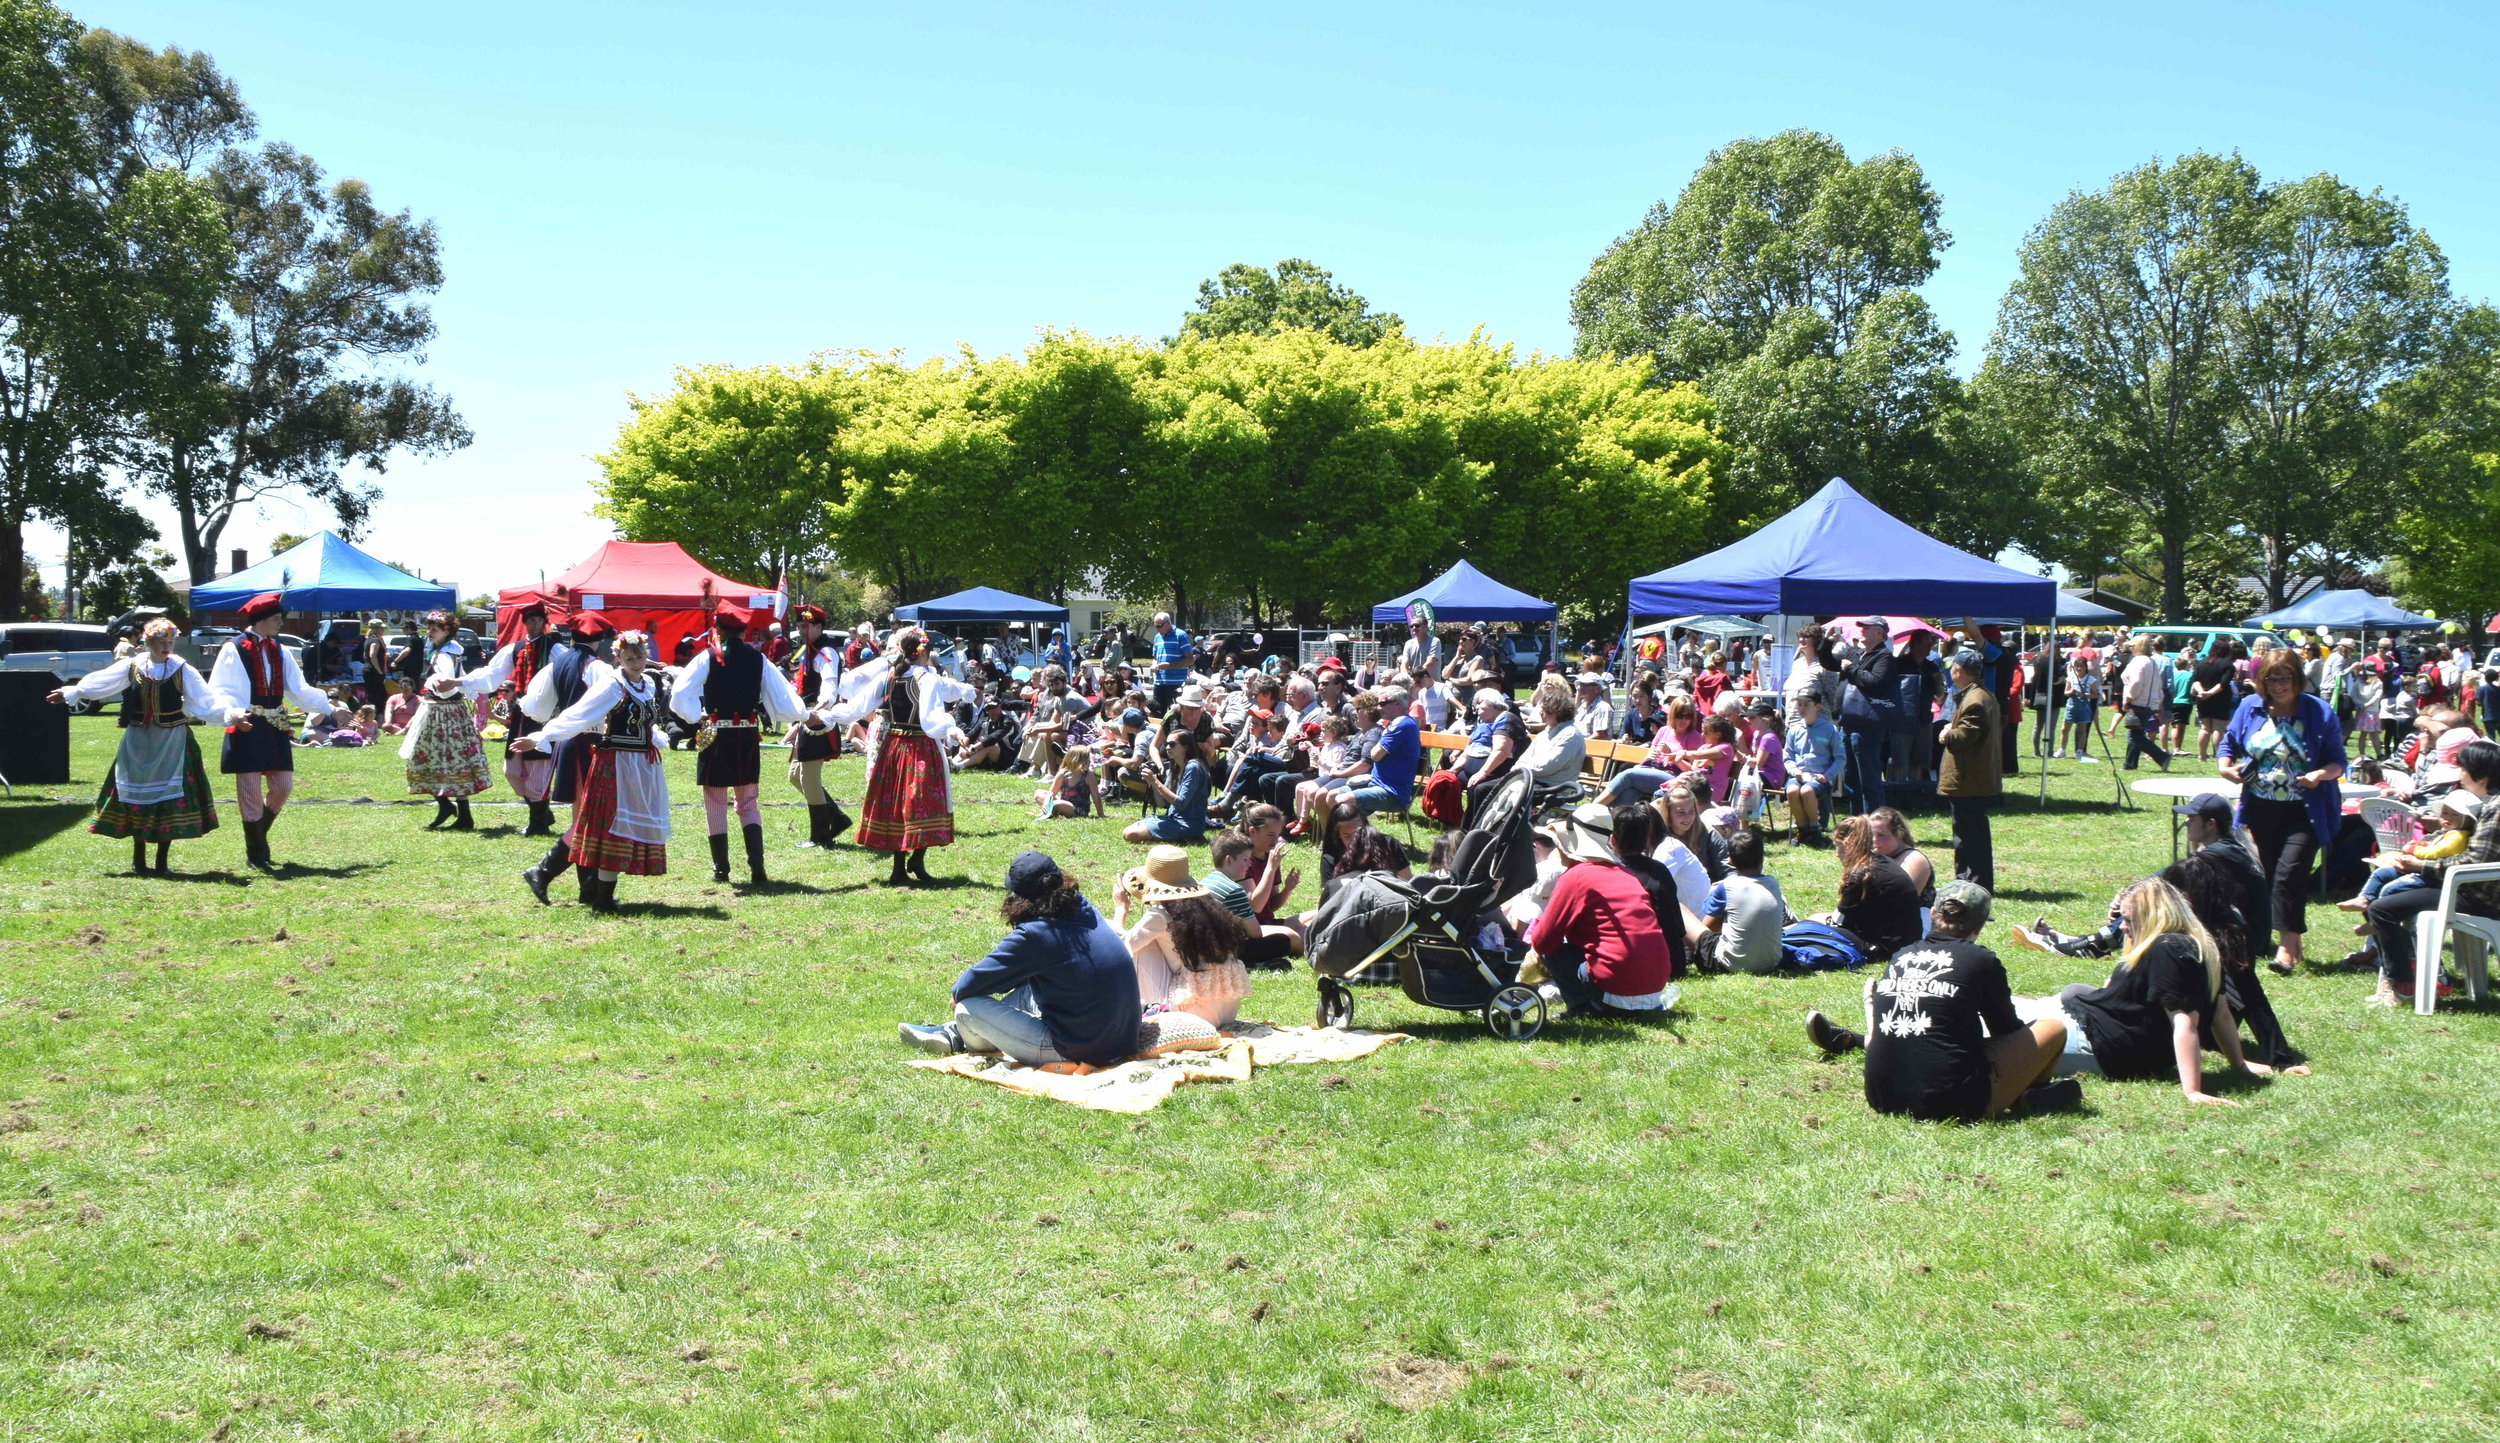 Polonus Polish Folk Dance entertaining the gathering at Celebrate Bishopdale 2016 in Christchurch on November 20